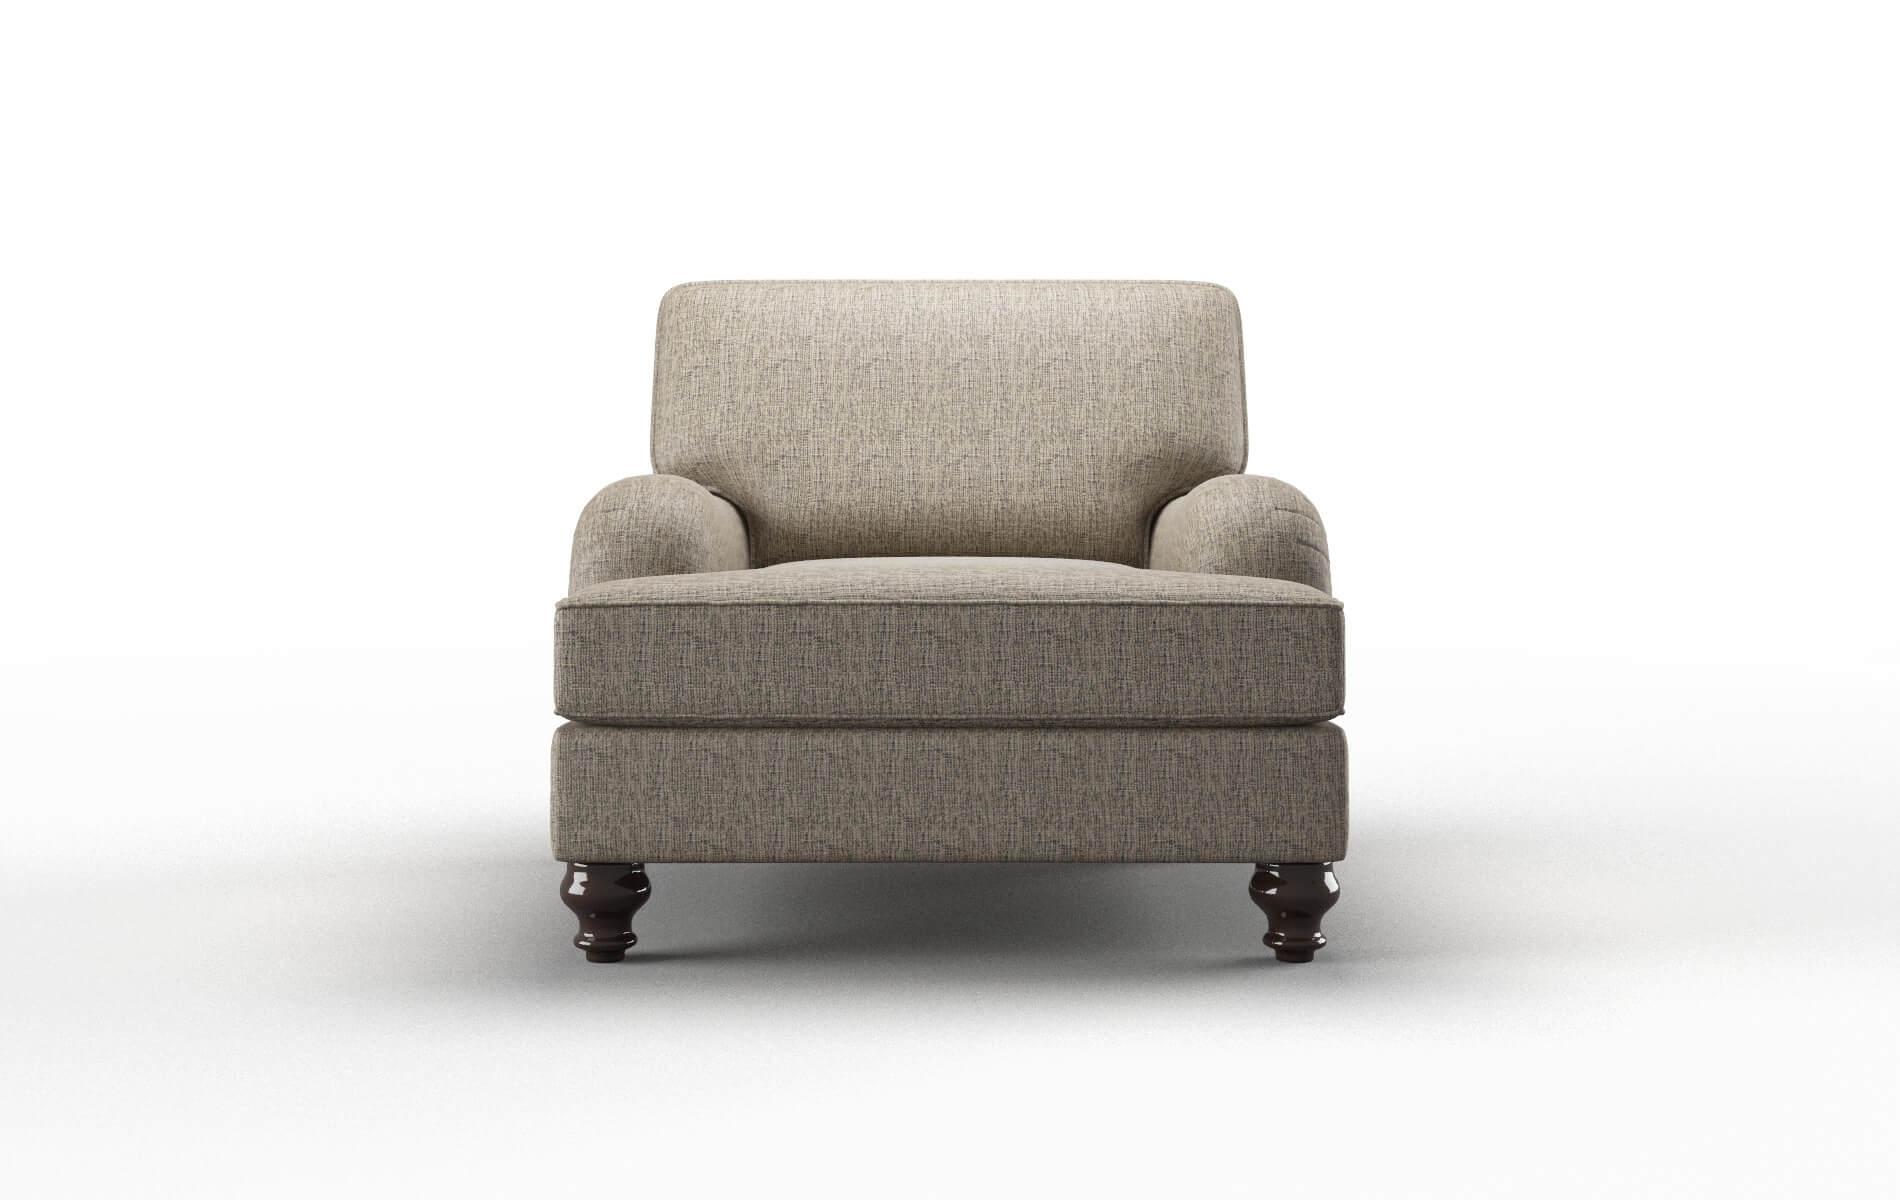 Hamilton Solifestyle 51 Chair espresso legs 1